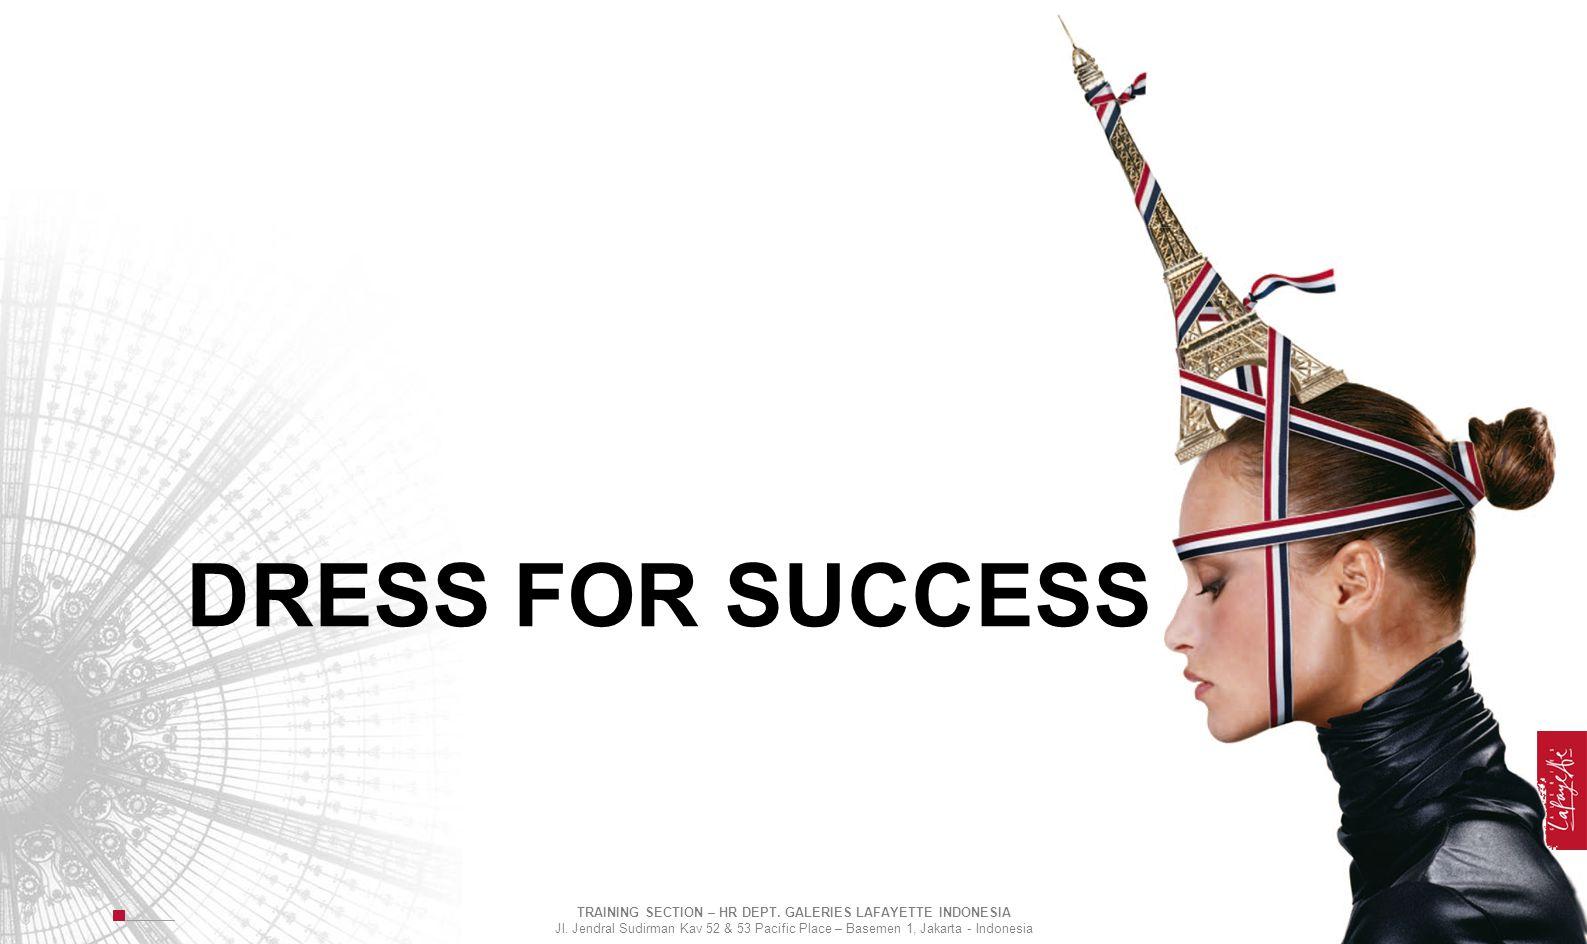 DRESS FOR SUCCESS TRAINING SECTION – HR DEPT. GALERIES LAFAYETTE INDONESIA Jl. Jendral Sudirman Kav 52 & 53 Pacific Place – Basemen 1, Jakarta - Indon